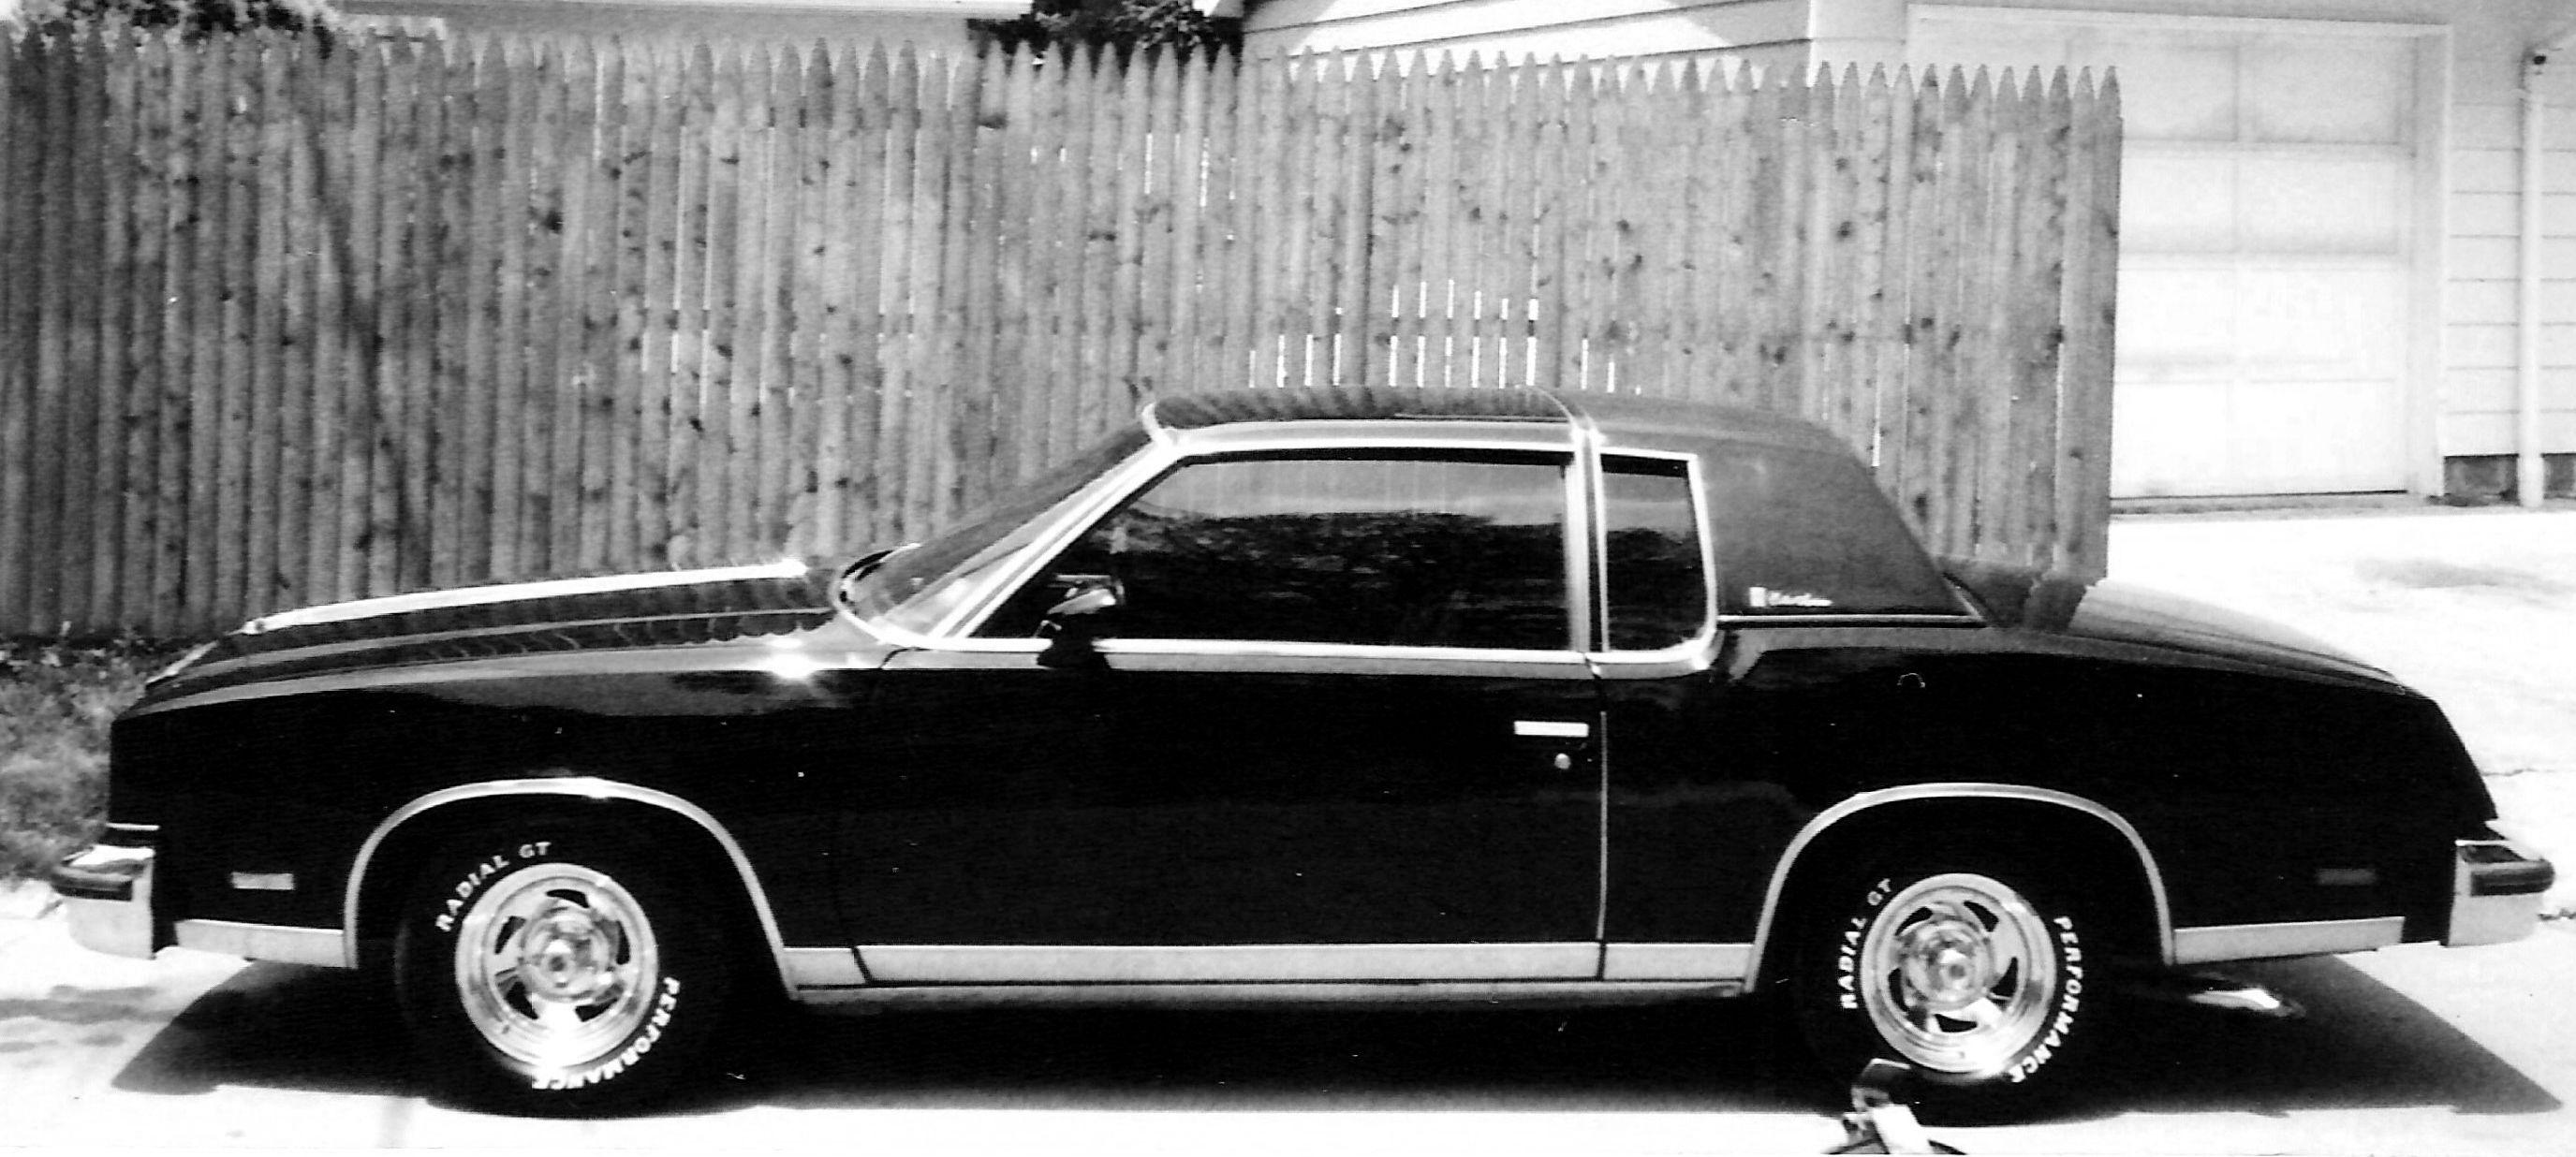 My 1979 79 Oldsmobile Cutlass Supreme My First Car Oldsmobile Cutlass Supreme Oldsmobile Oldsmobile Cutlass